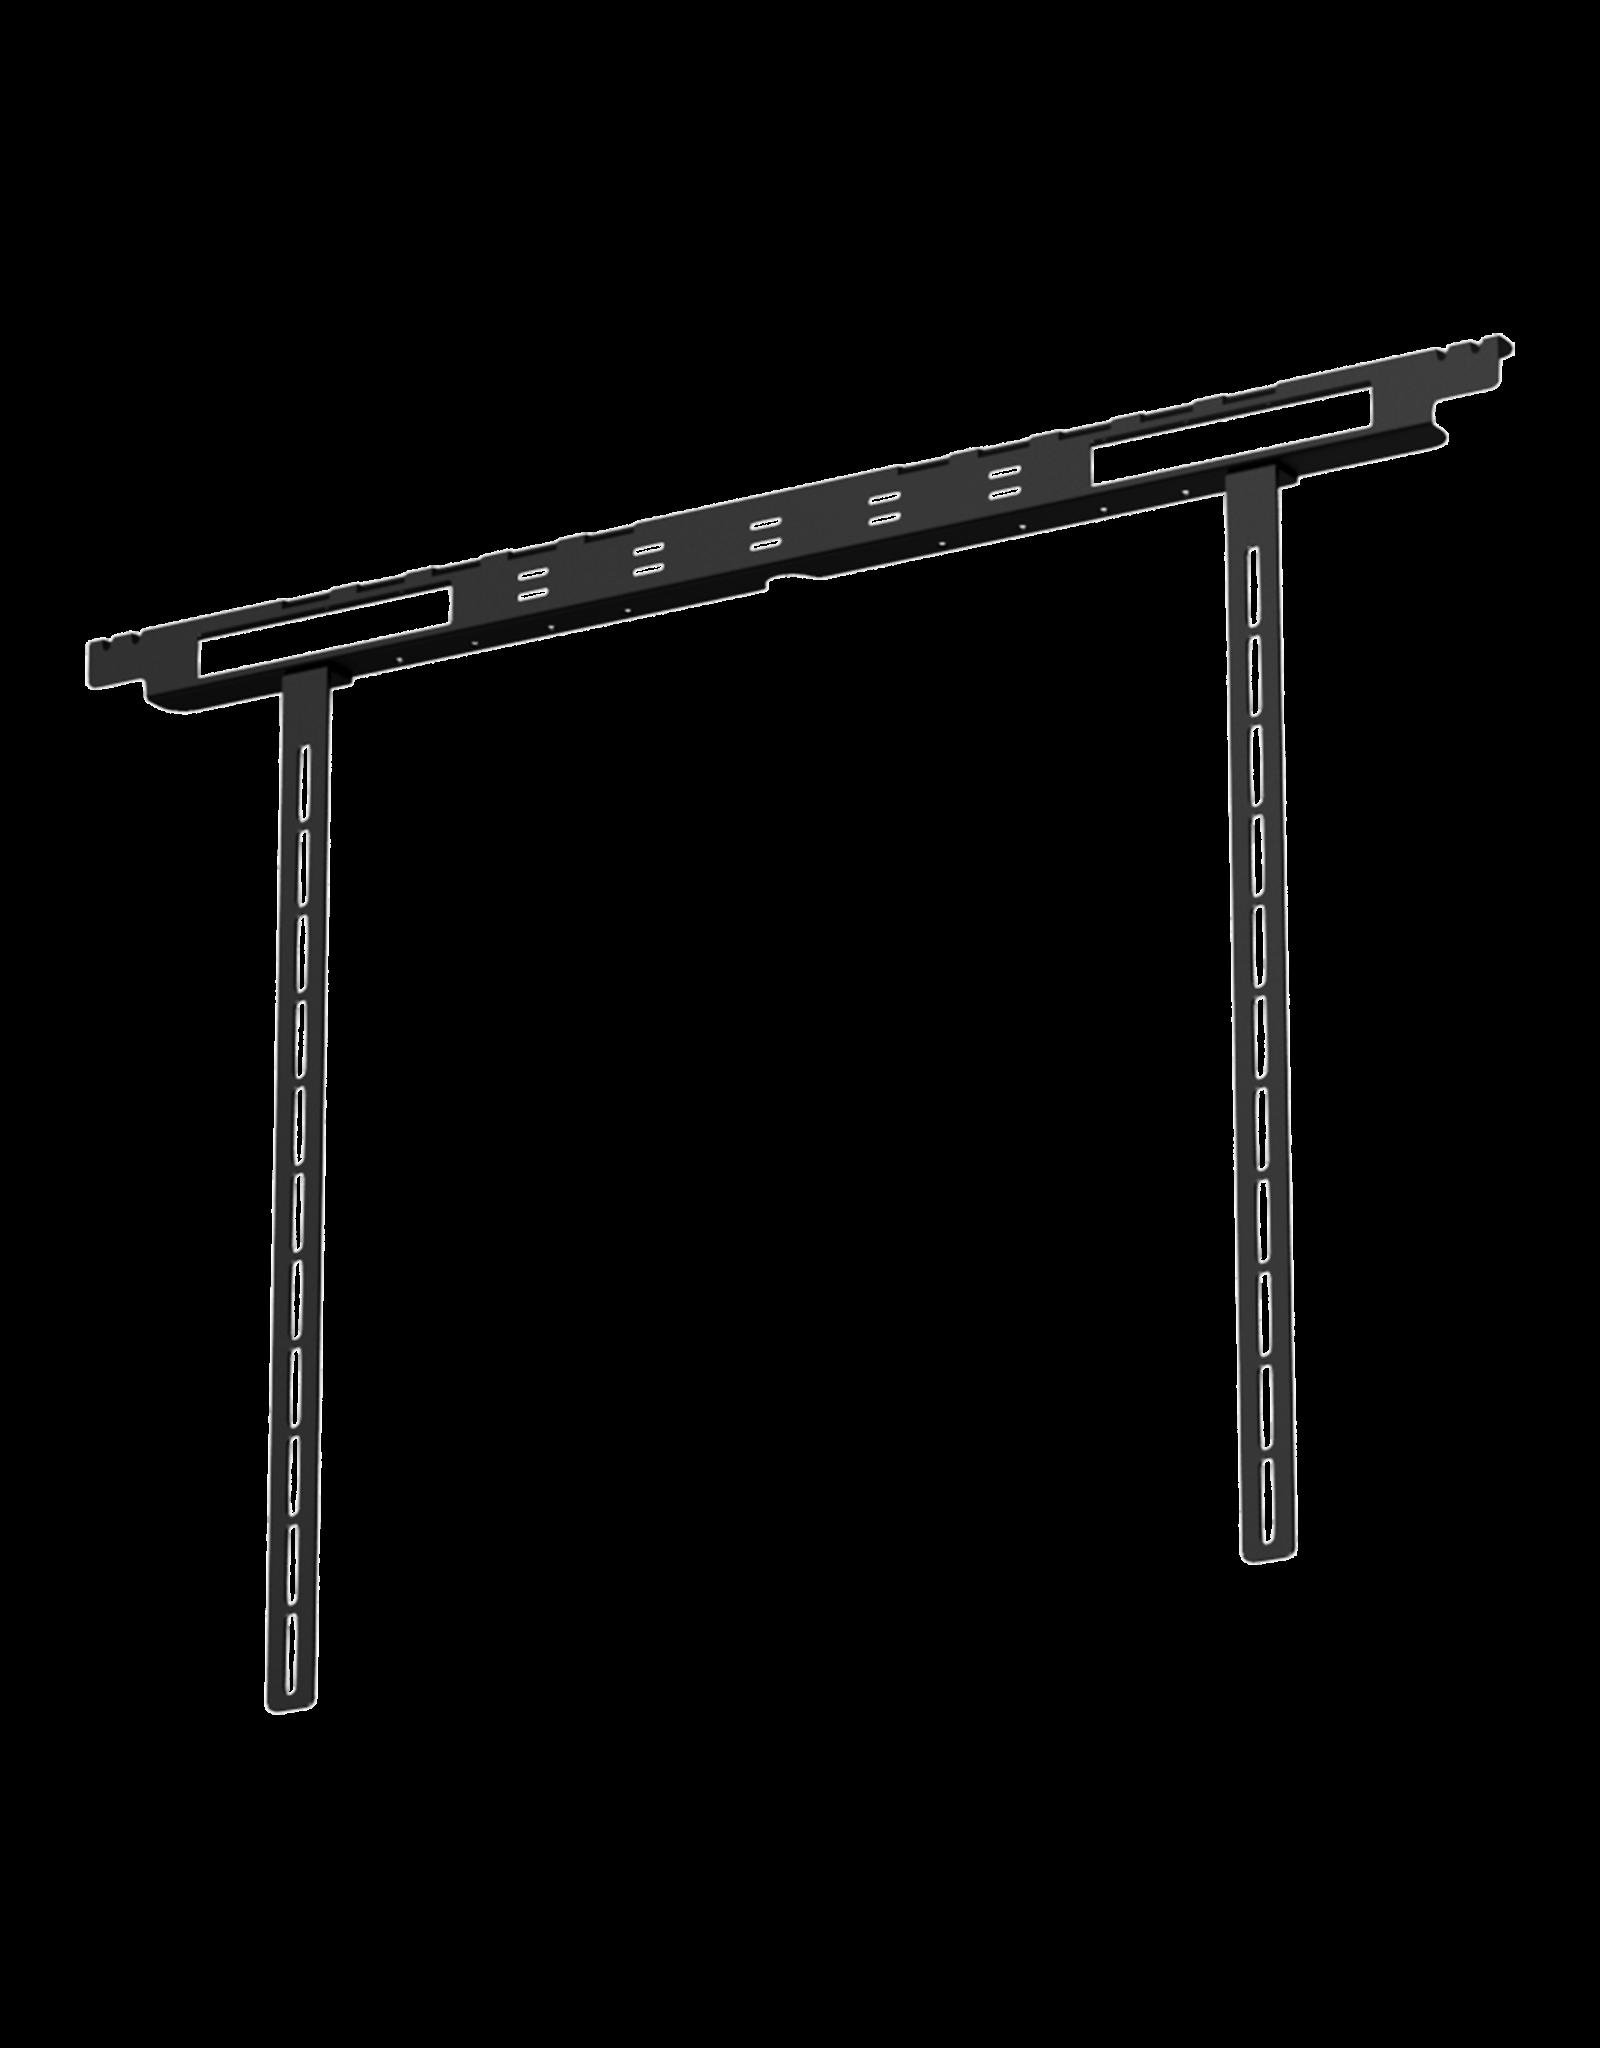 Audac Screen mount bracket for IMEO1 Black version